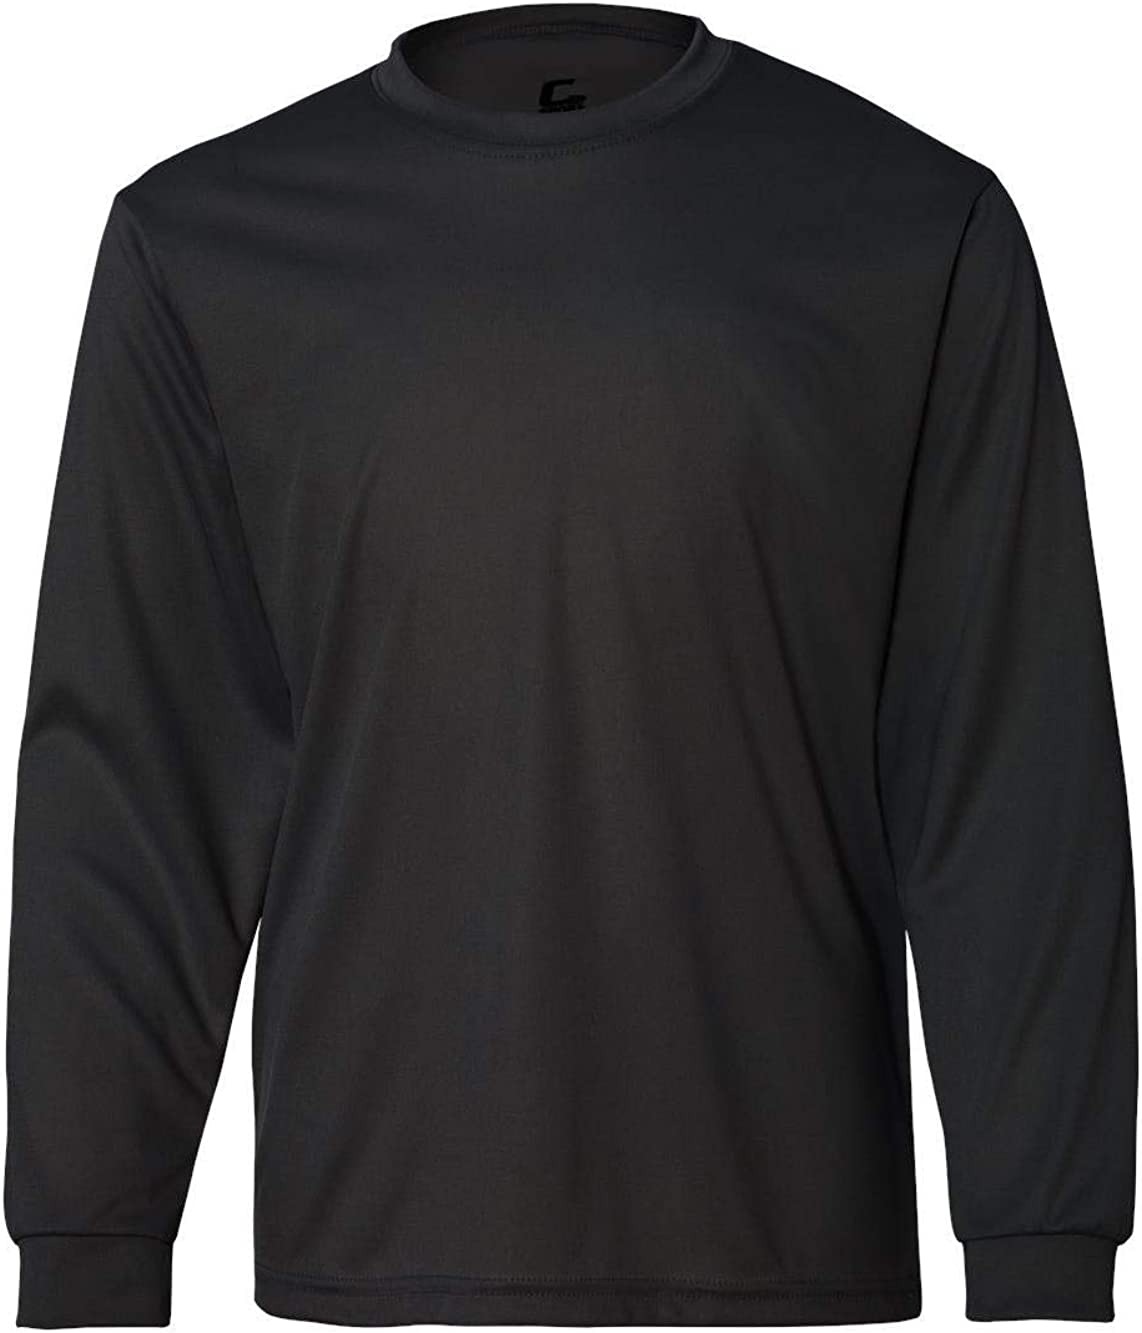 C2 Sport 5204 Youth Long Sleeve T-Shirt